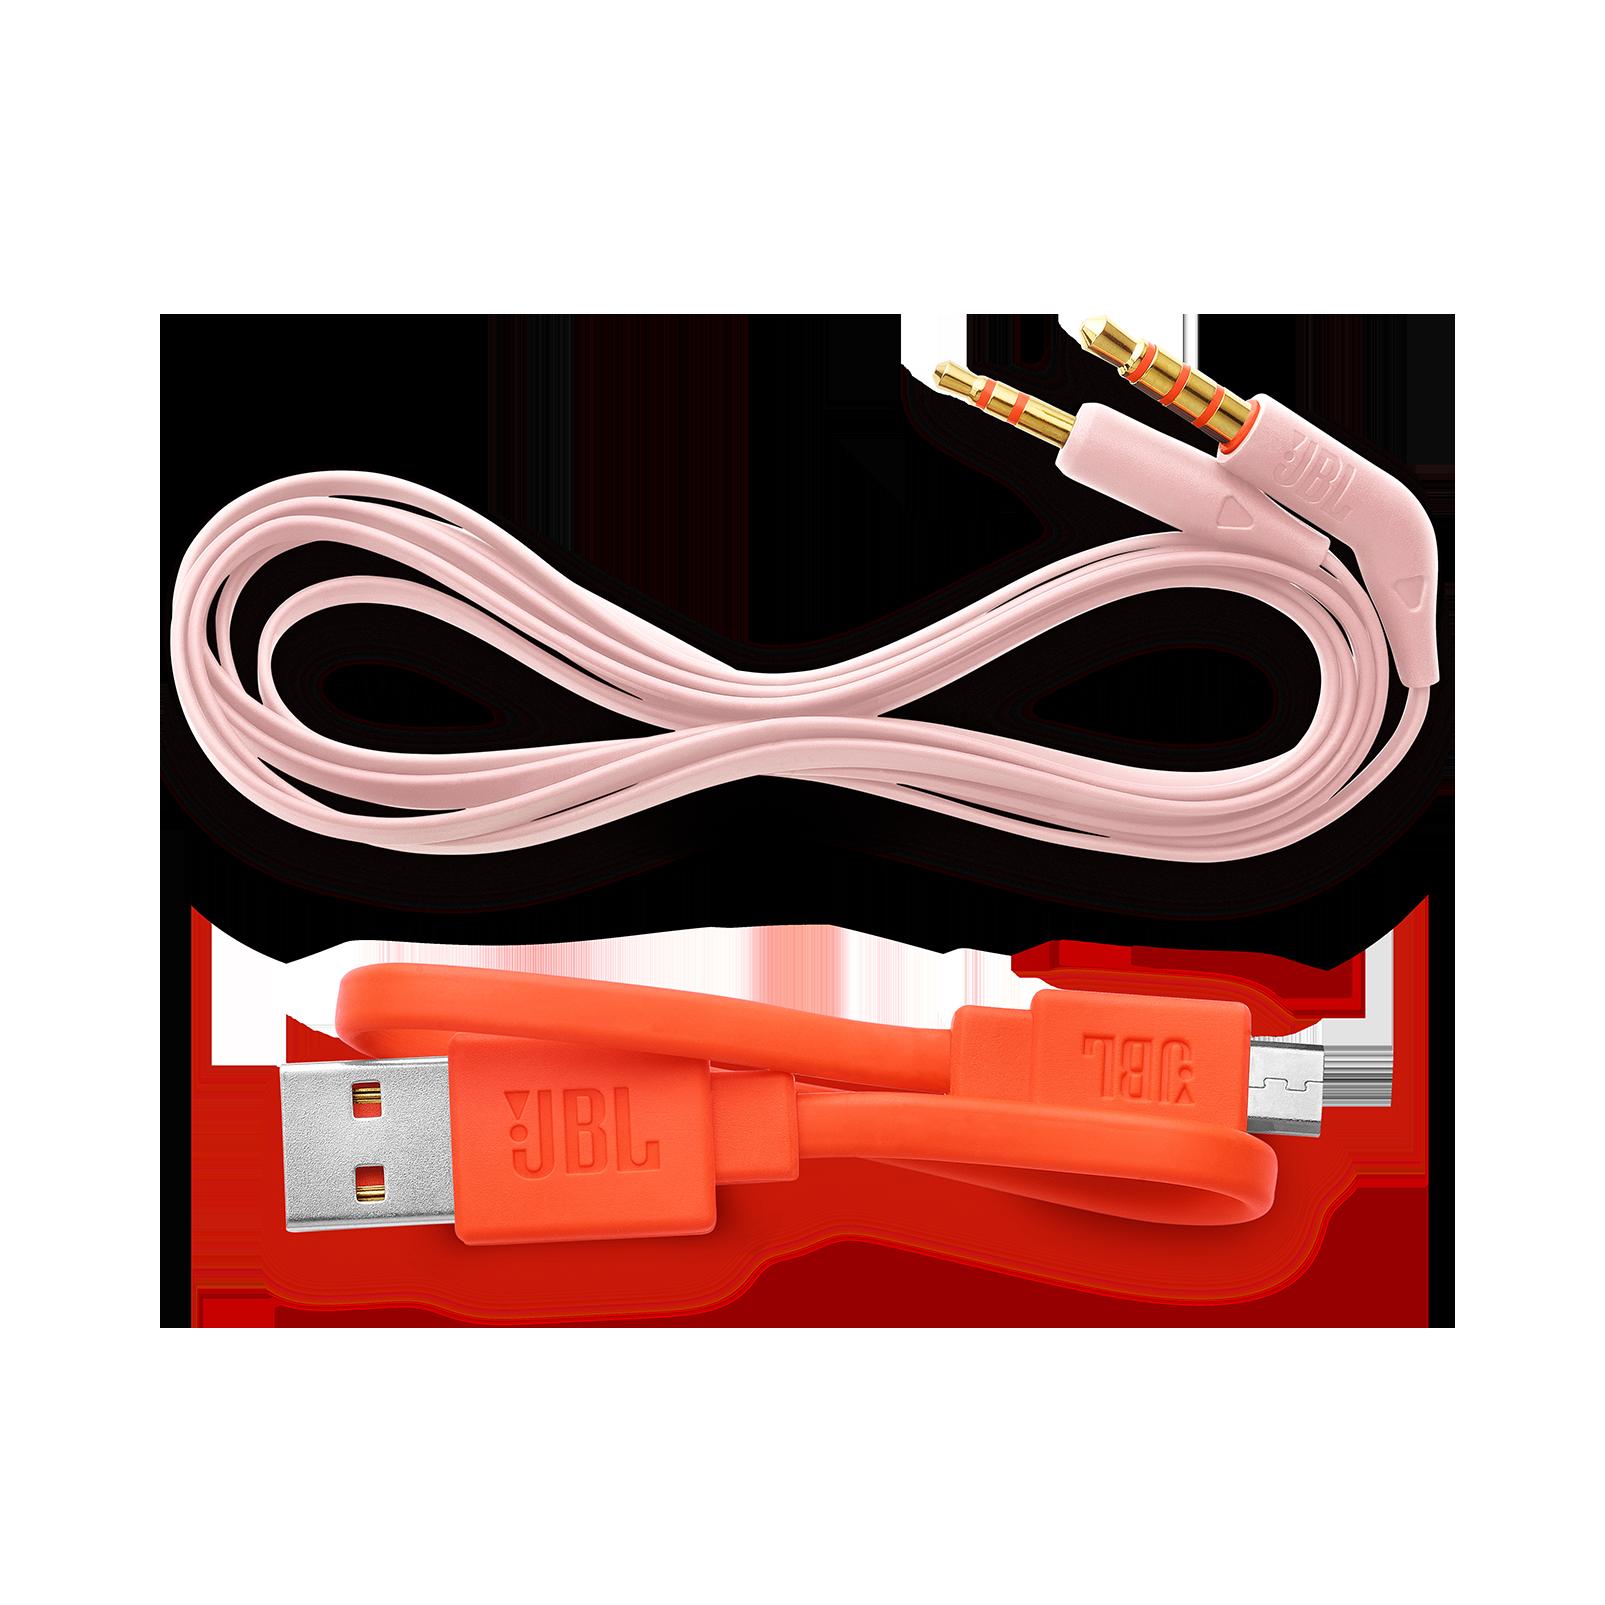 JBL TUNE 600BTNC - Pink - Wireless, on-ear, active noise-cancelling headphones. - Detailshot 5